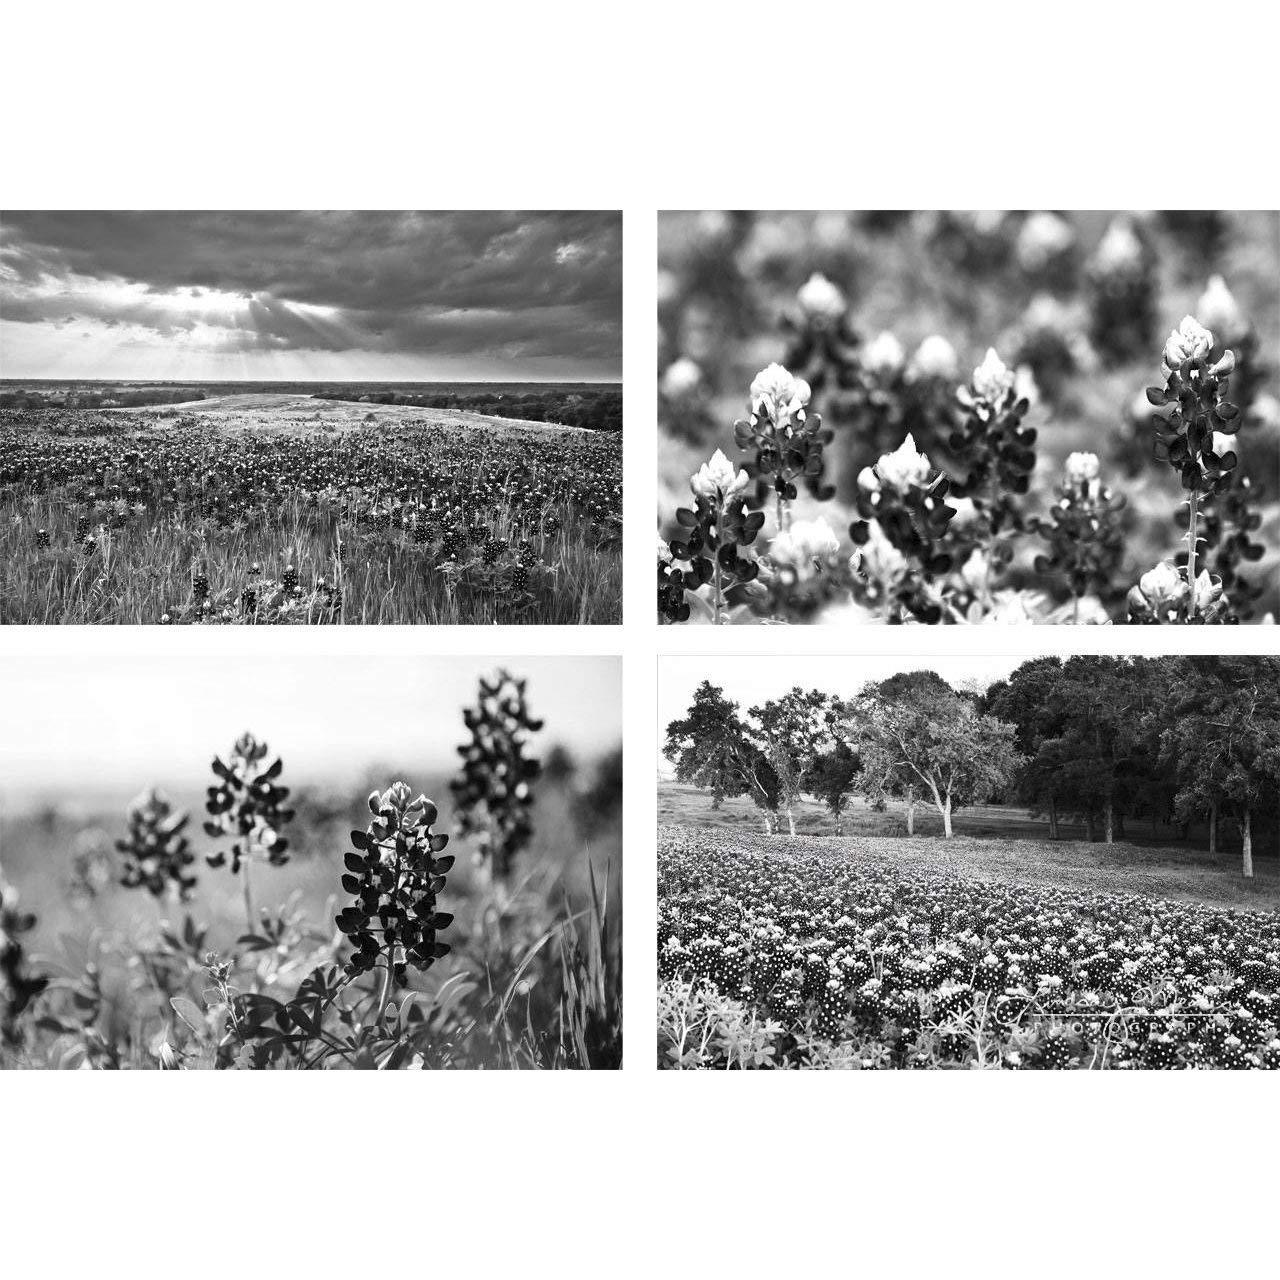 black and white texas photography large wall art where the buffalo roam abilene texas western landscape ranch decor Texas photography